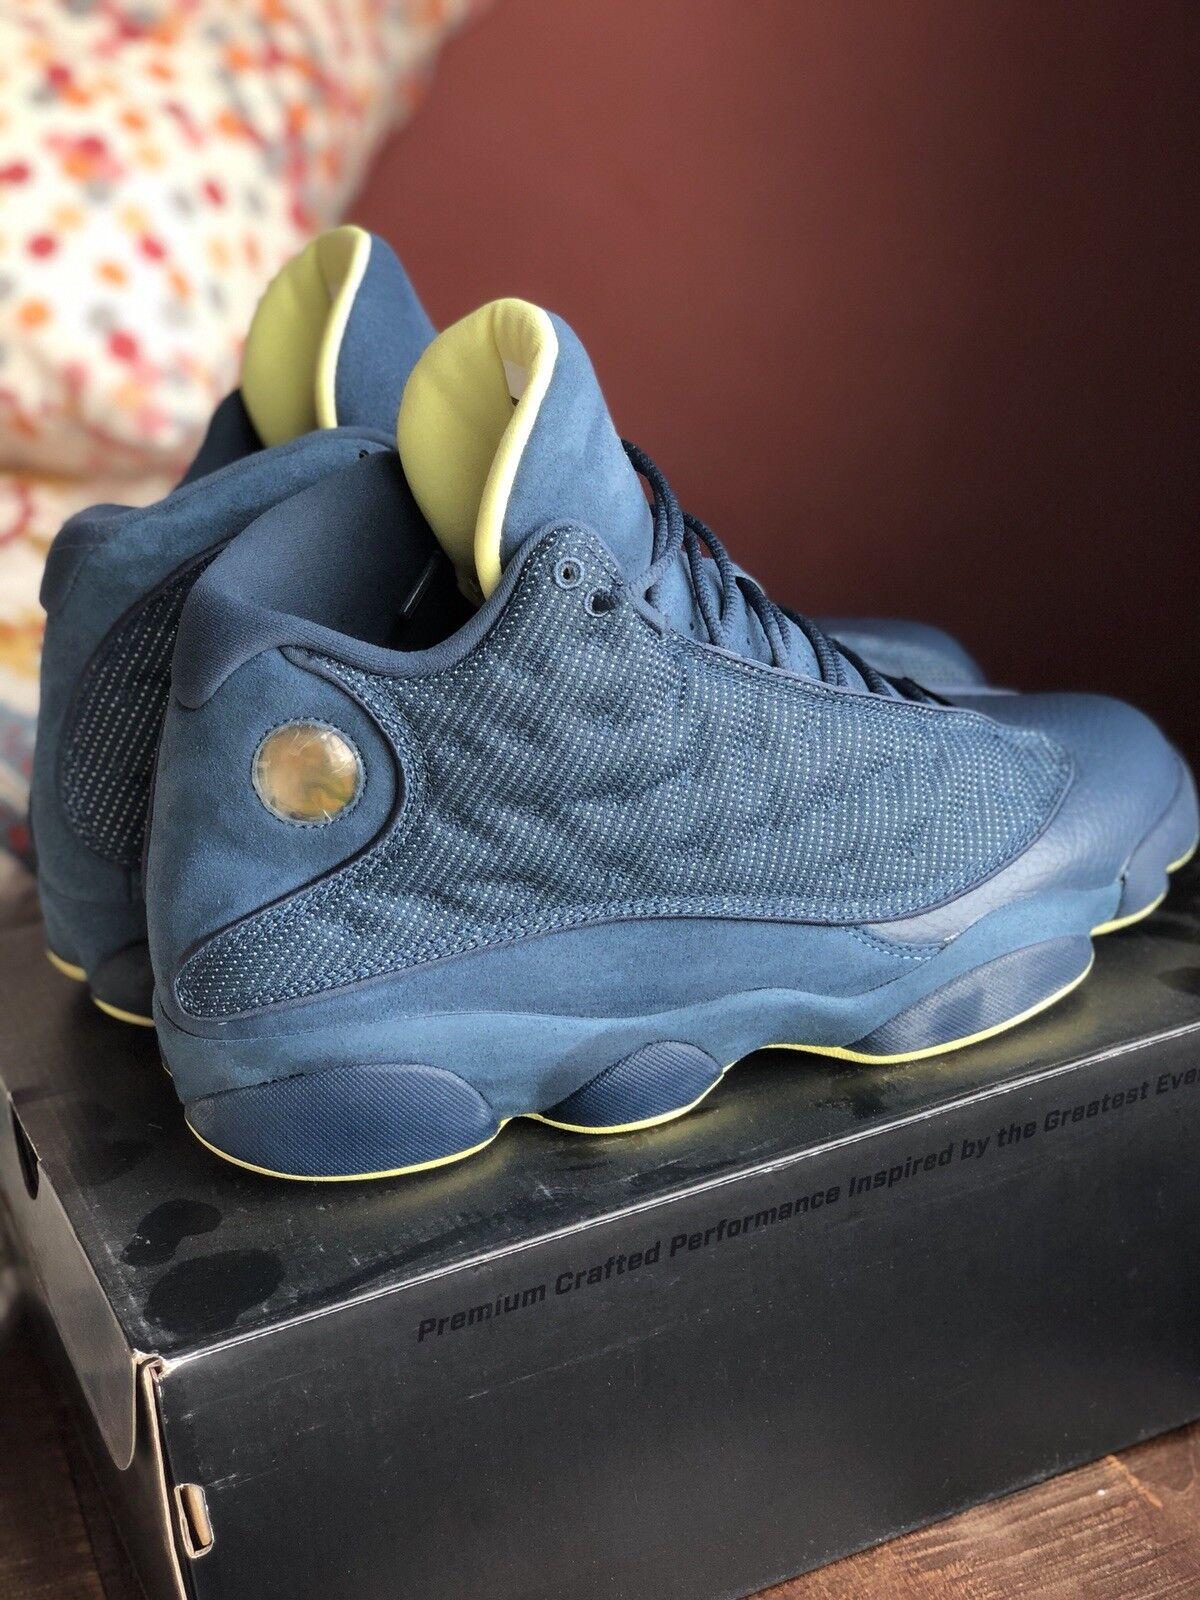 Nike air jordan 13 la squadra blu, scarpe taglia 12 - 13 - leggermente usato con ricevuta